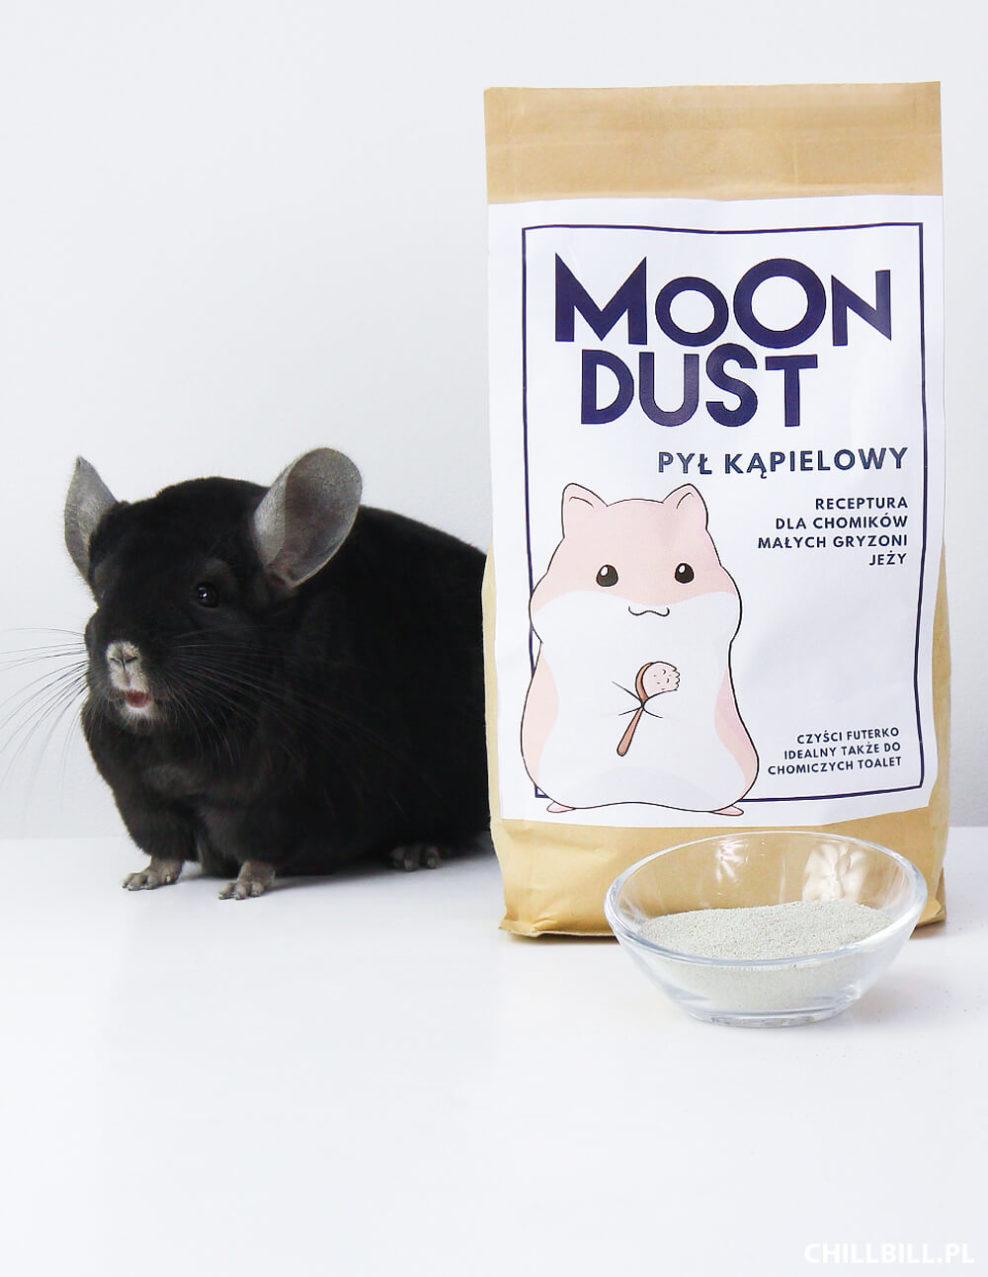 moon dust piasek dla chomików